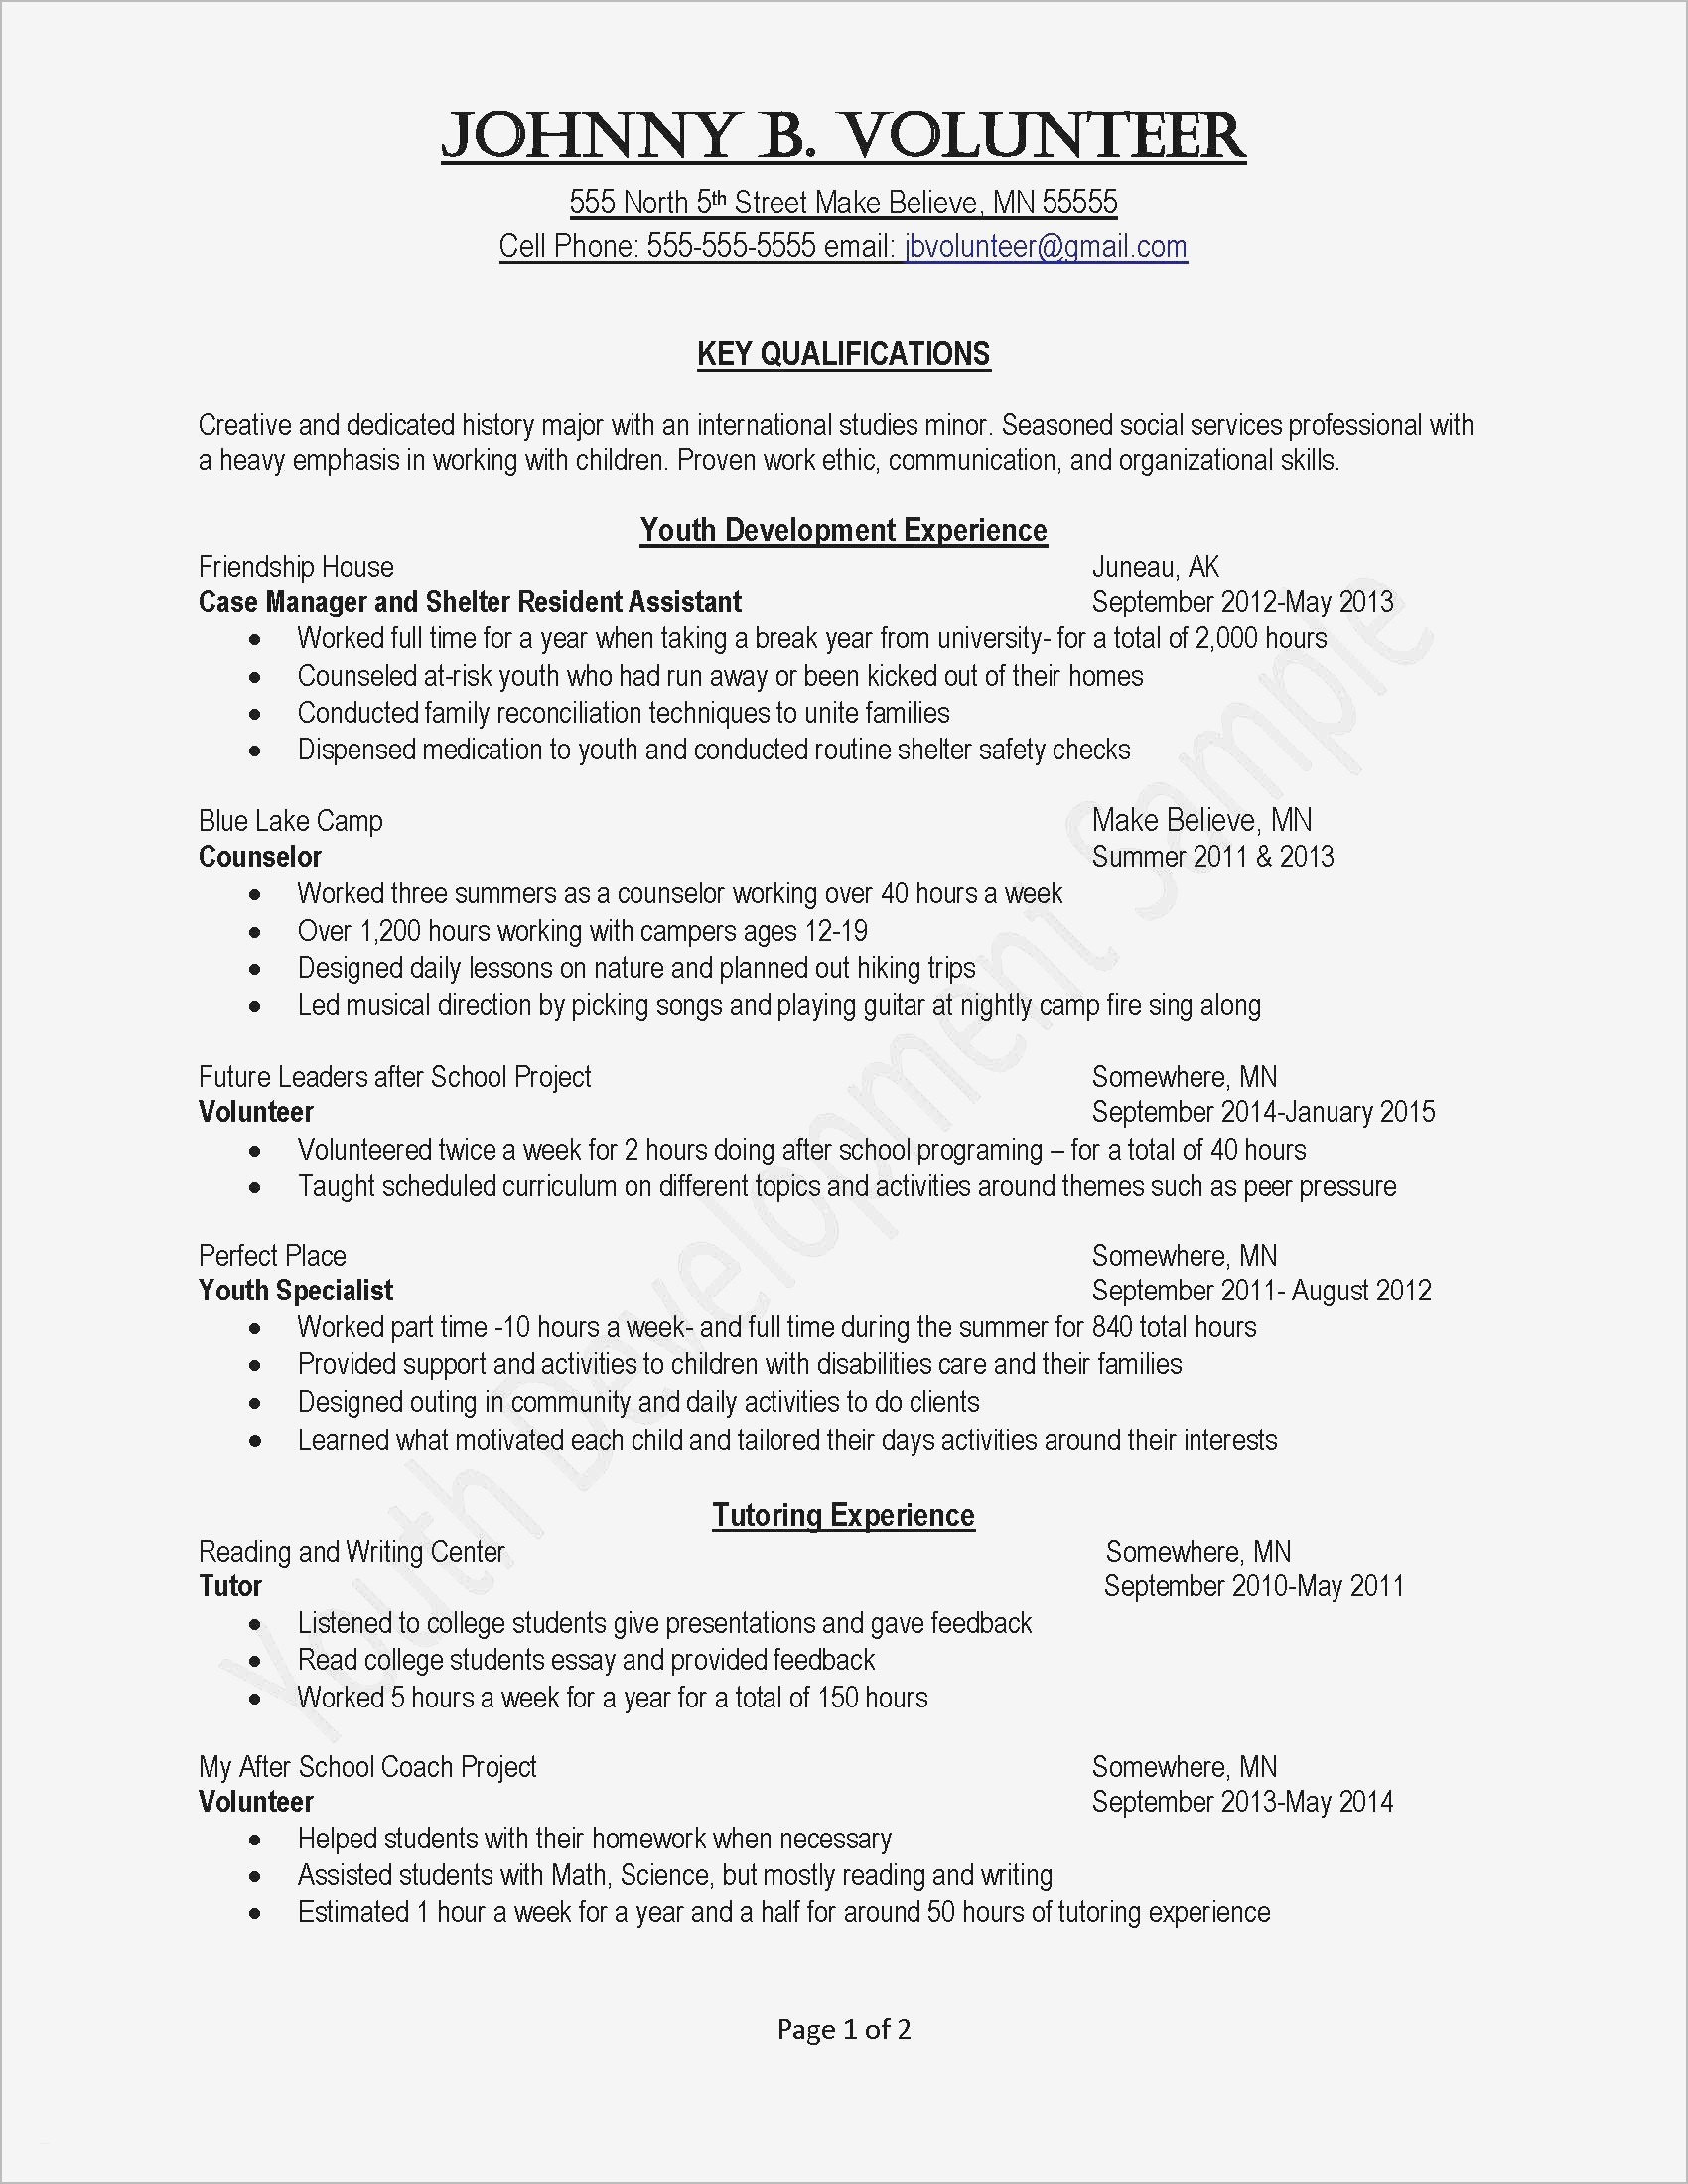 Cover Letter Template Australia - Free Resume Template Australia Simple Job Fer Letter Template Us